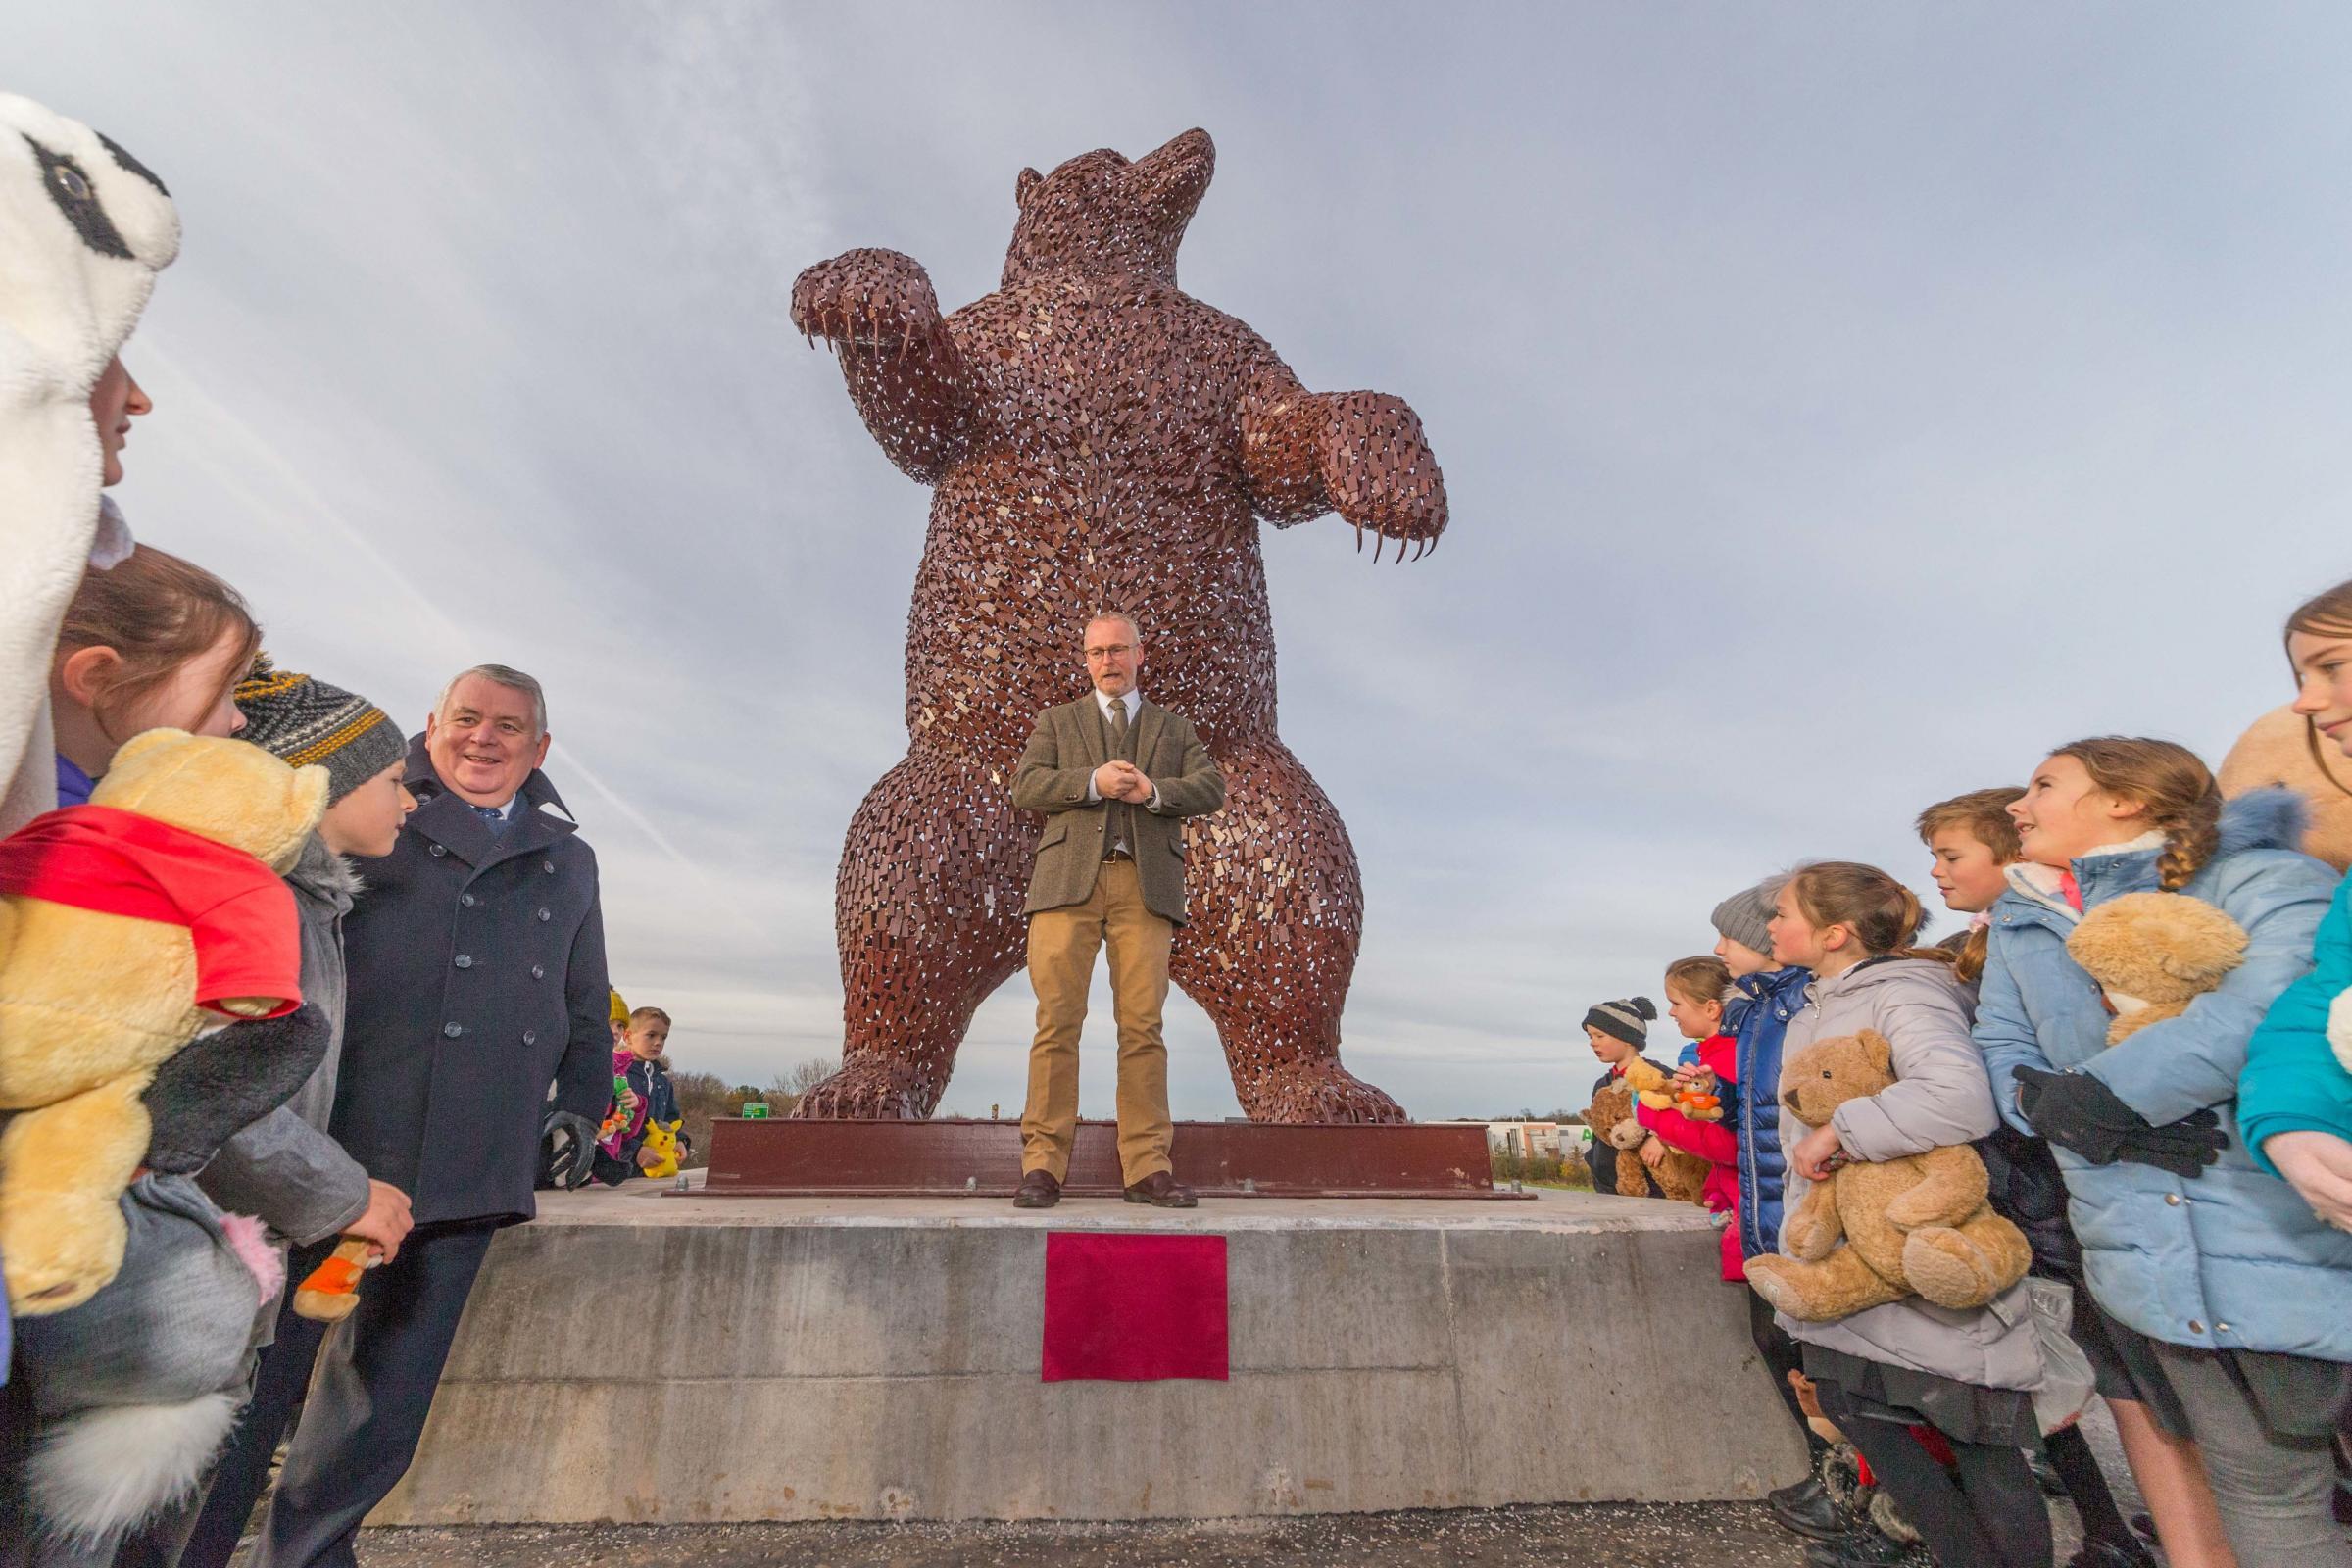 PICTURES: Dunbar's new bear sculpture near A1 unveiled